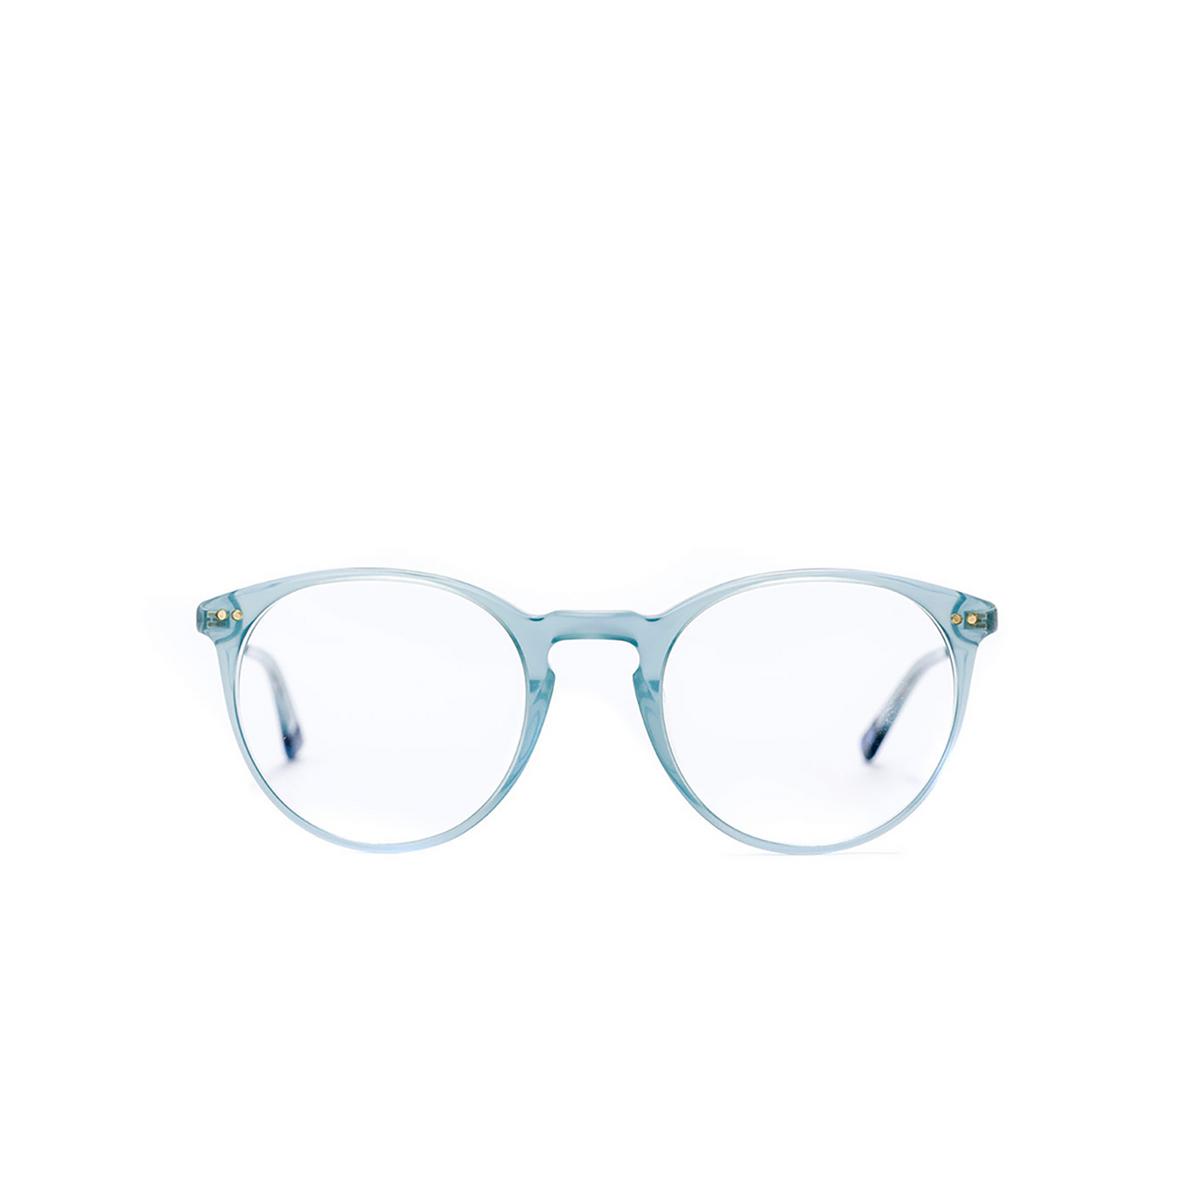 Etnia Barcelona® Round Eyeglasses: Jordaan Met color Blgd - front view.